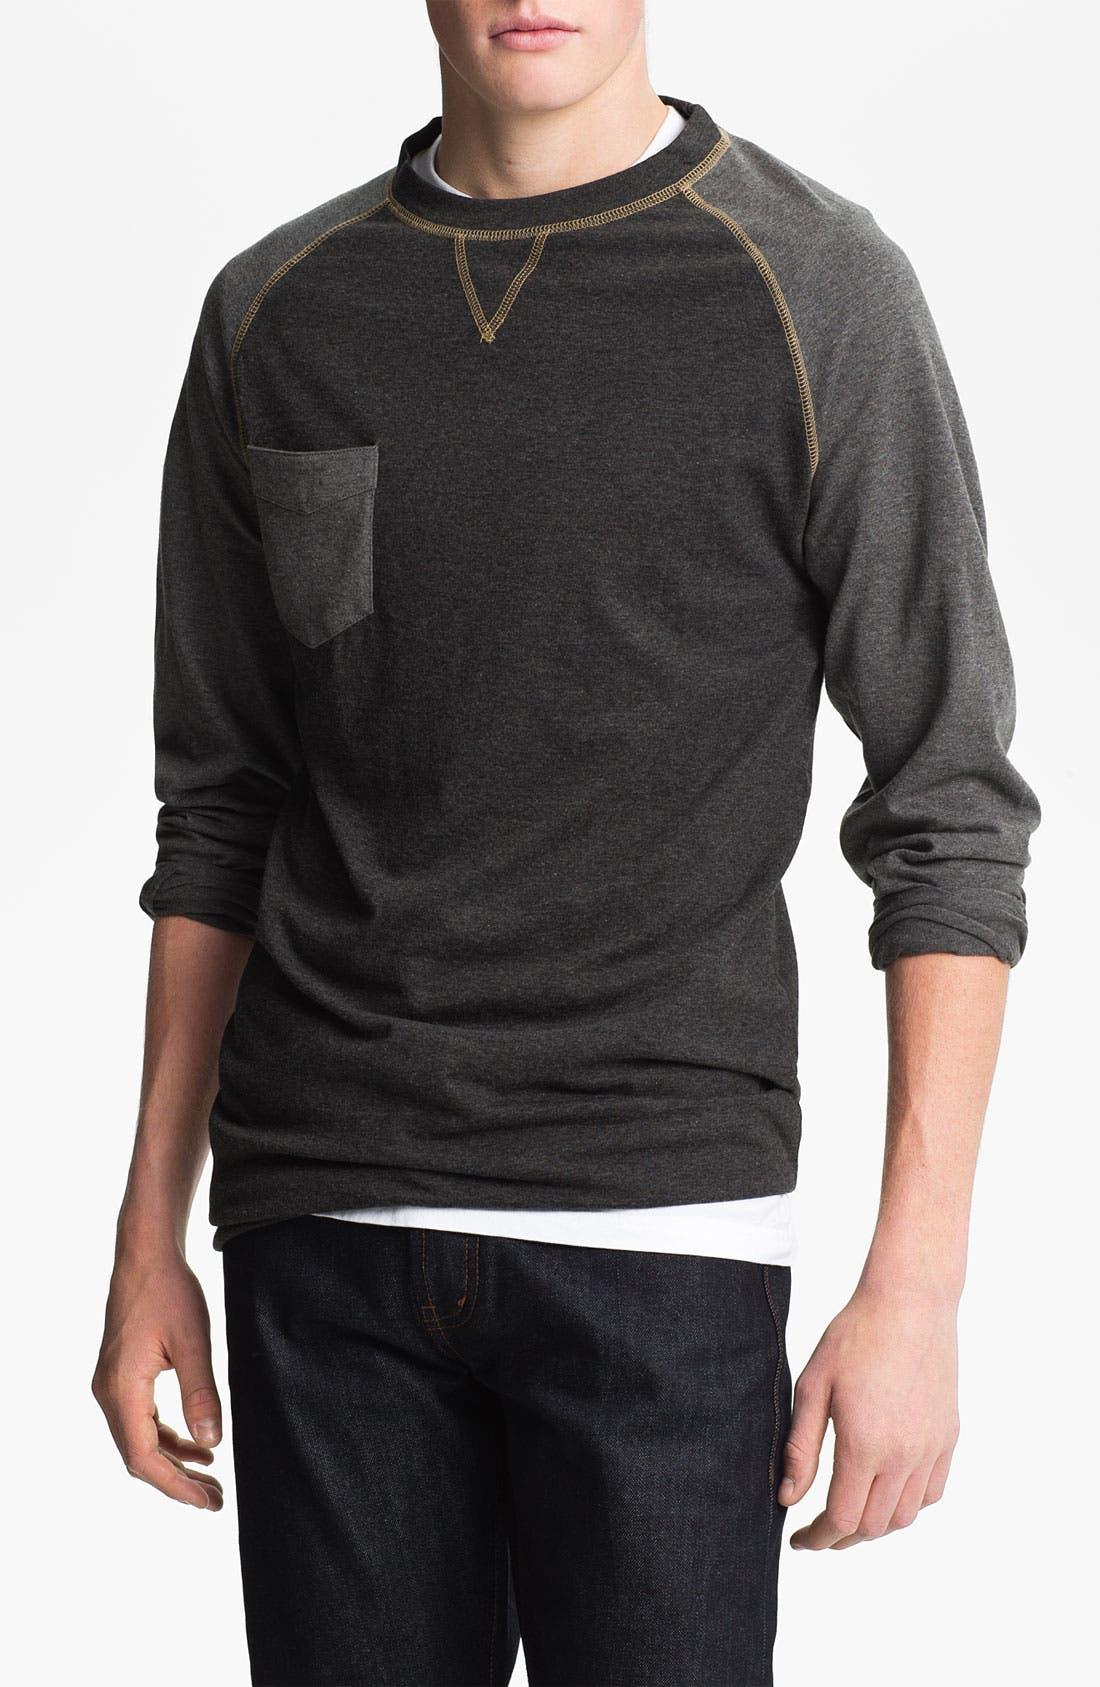 Main Image - Ezekiel 'Gym Class' Crewneck Sweatshirt